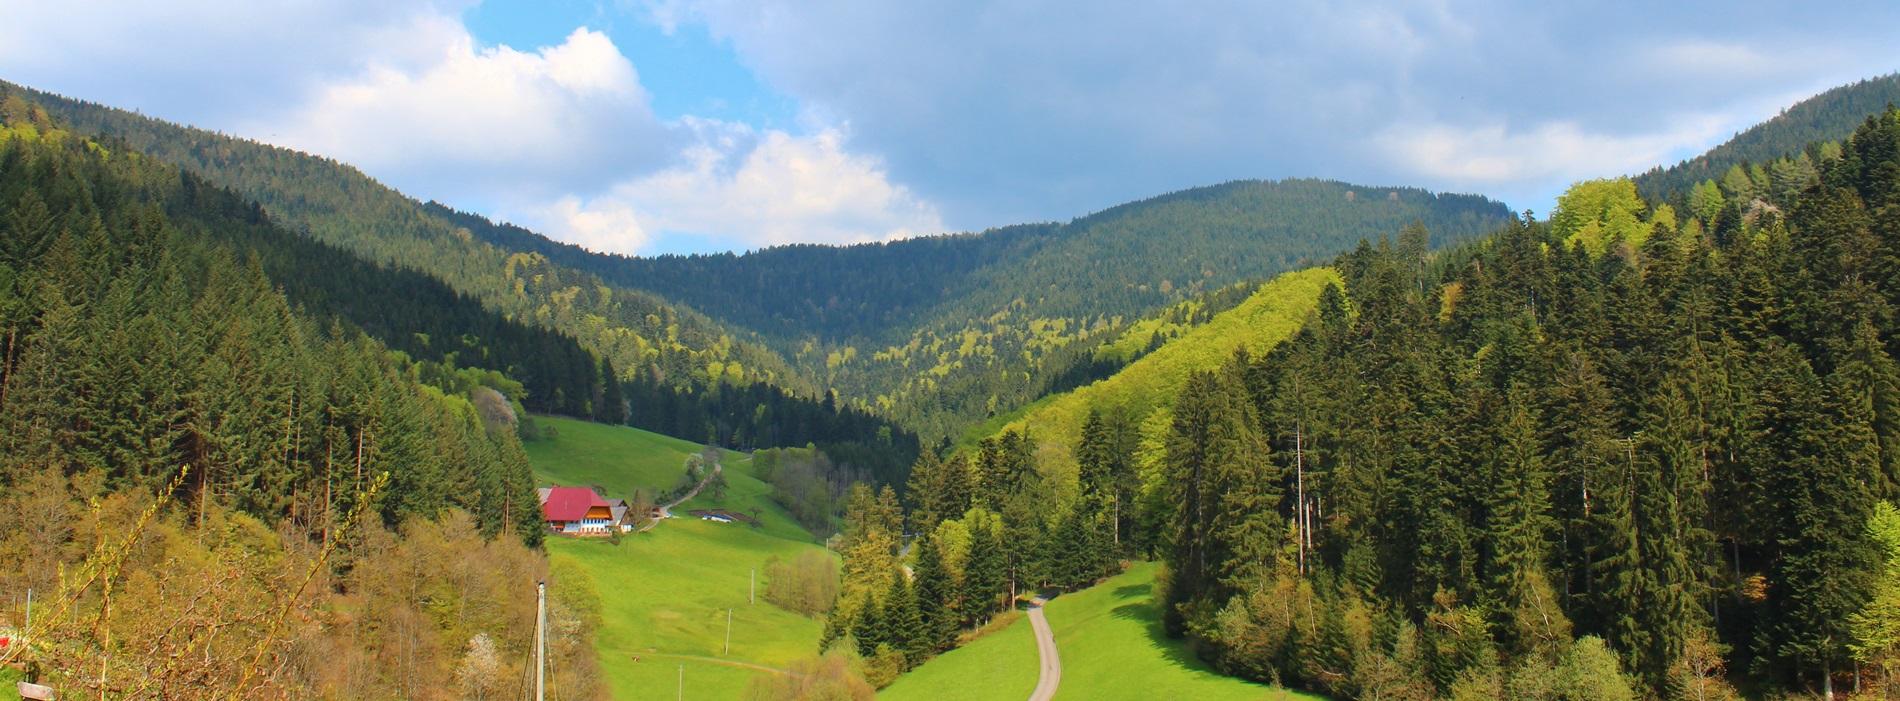 Zuwald Oberharmersbach Stinneshof